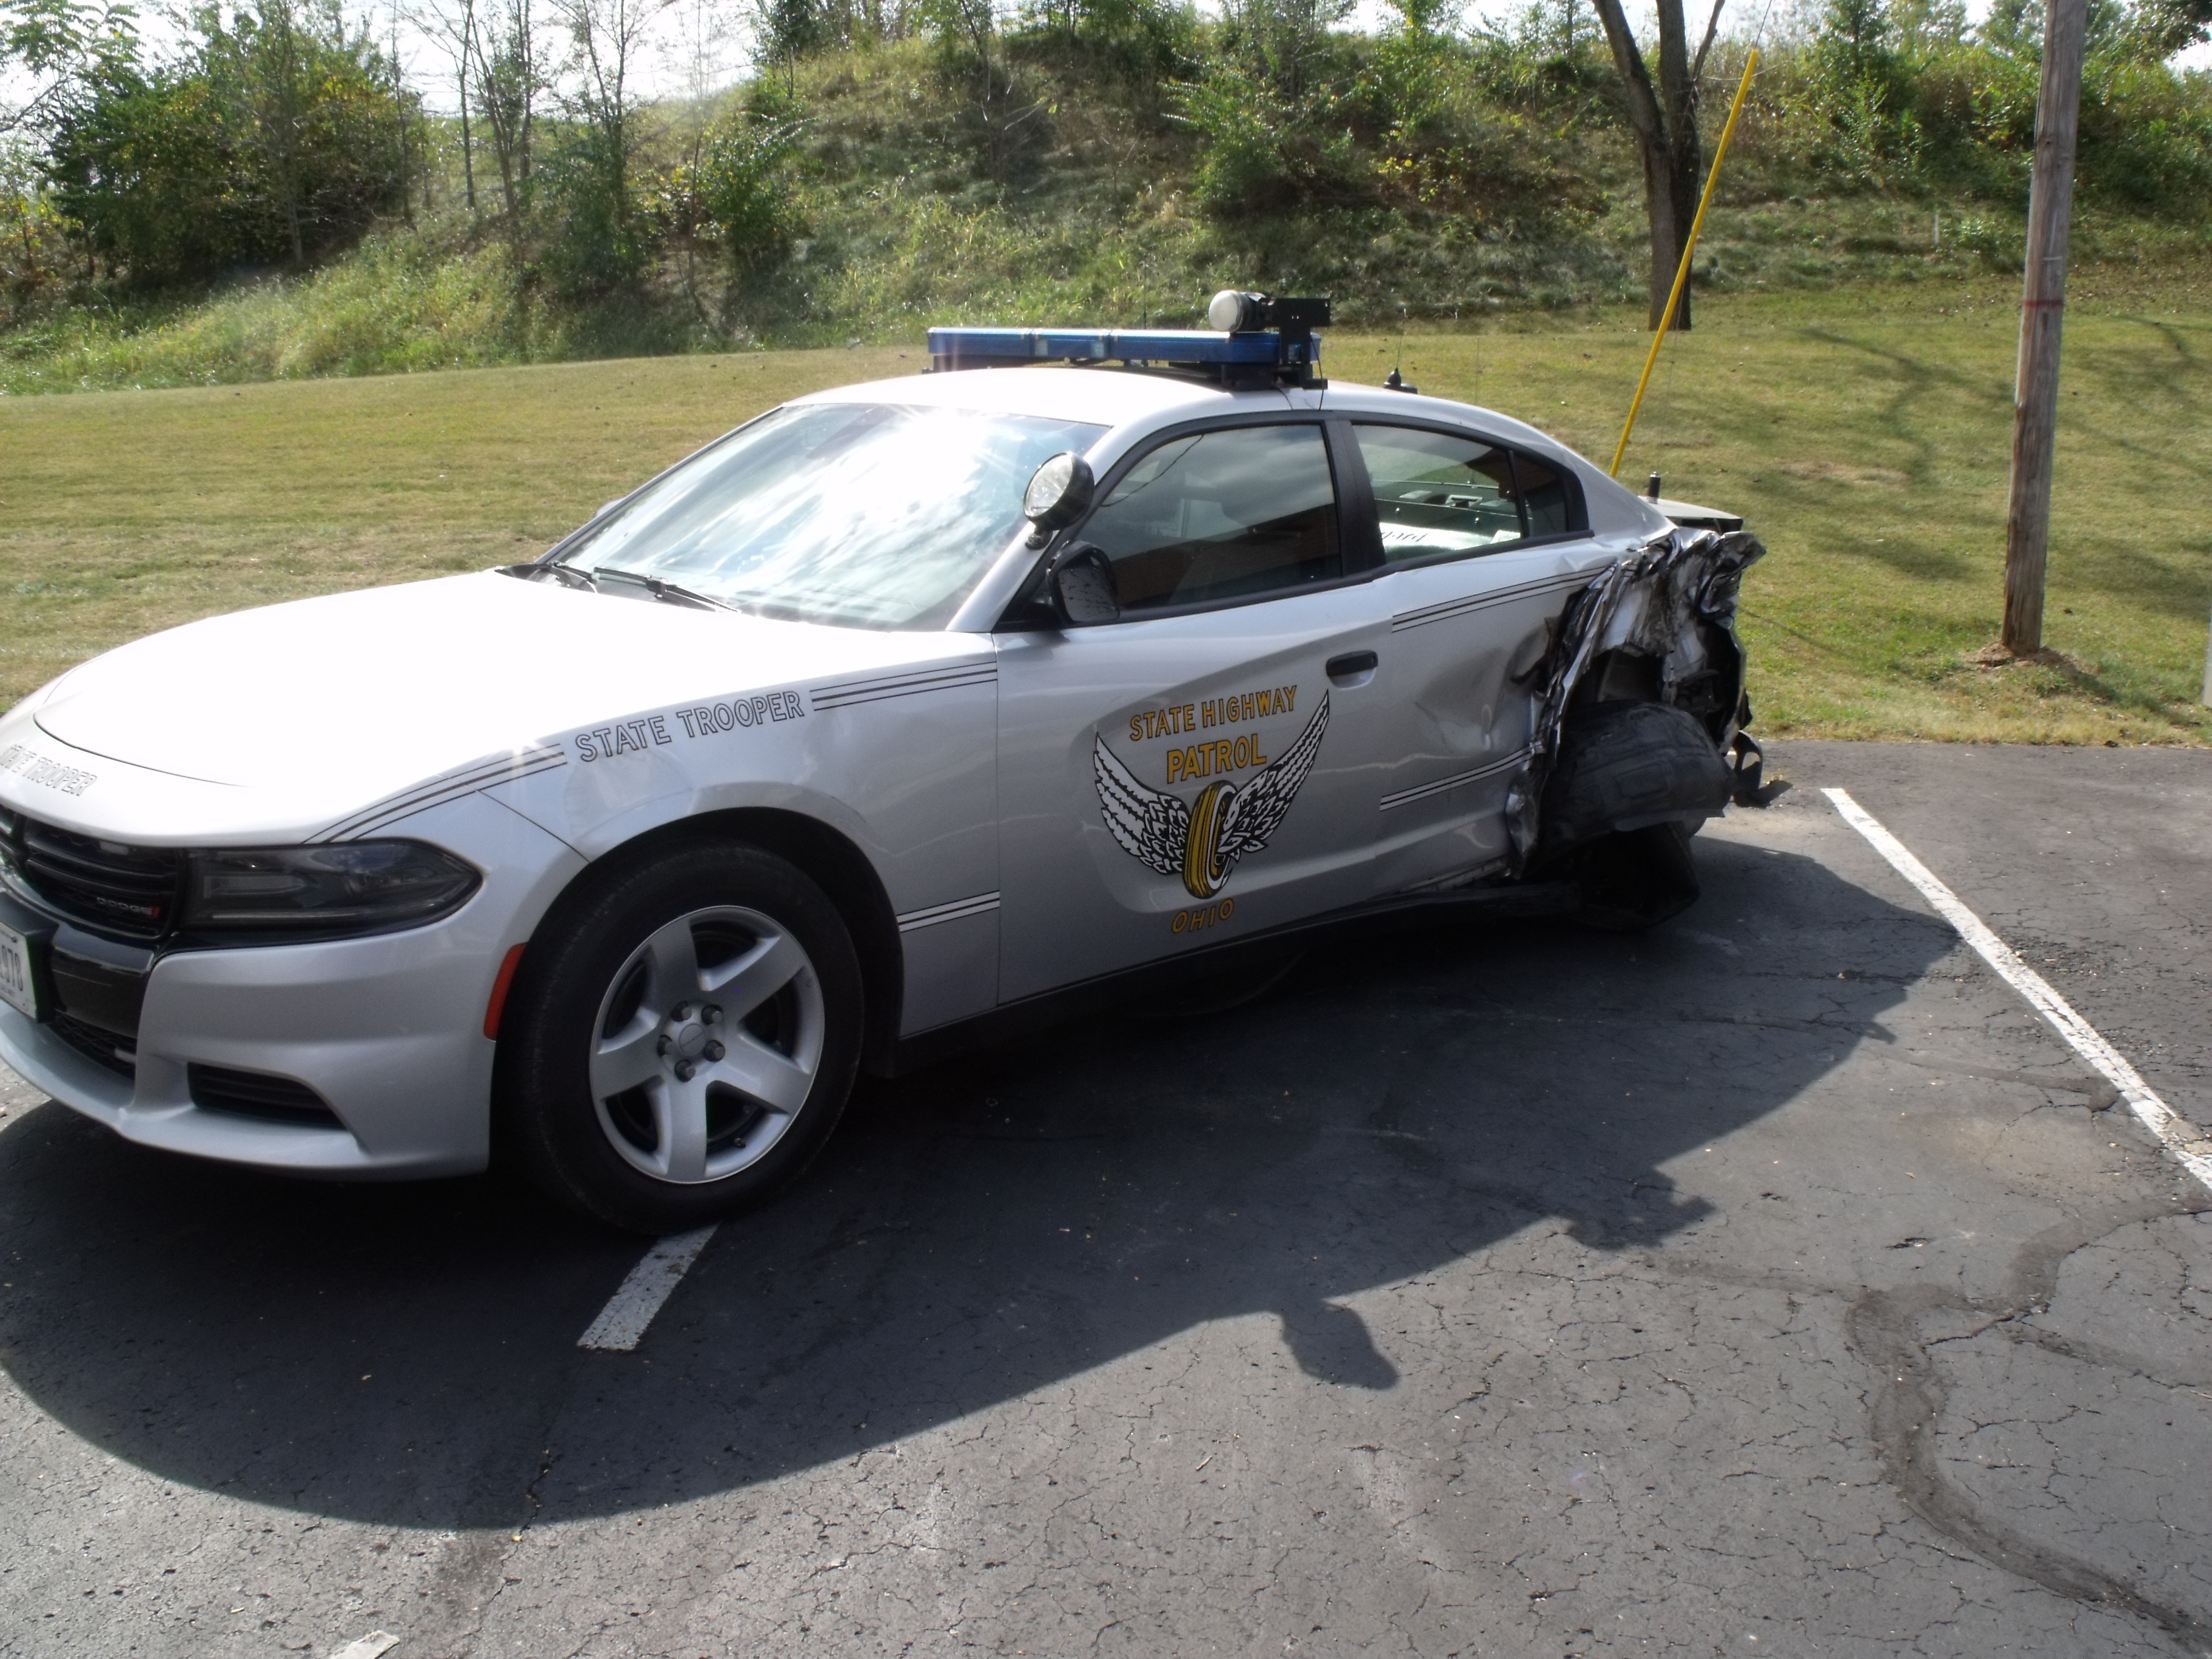 BREAKING: Ohio State Patrol Crusier Struck on I-71 in Pickaway County - Scioto Post